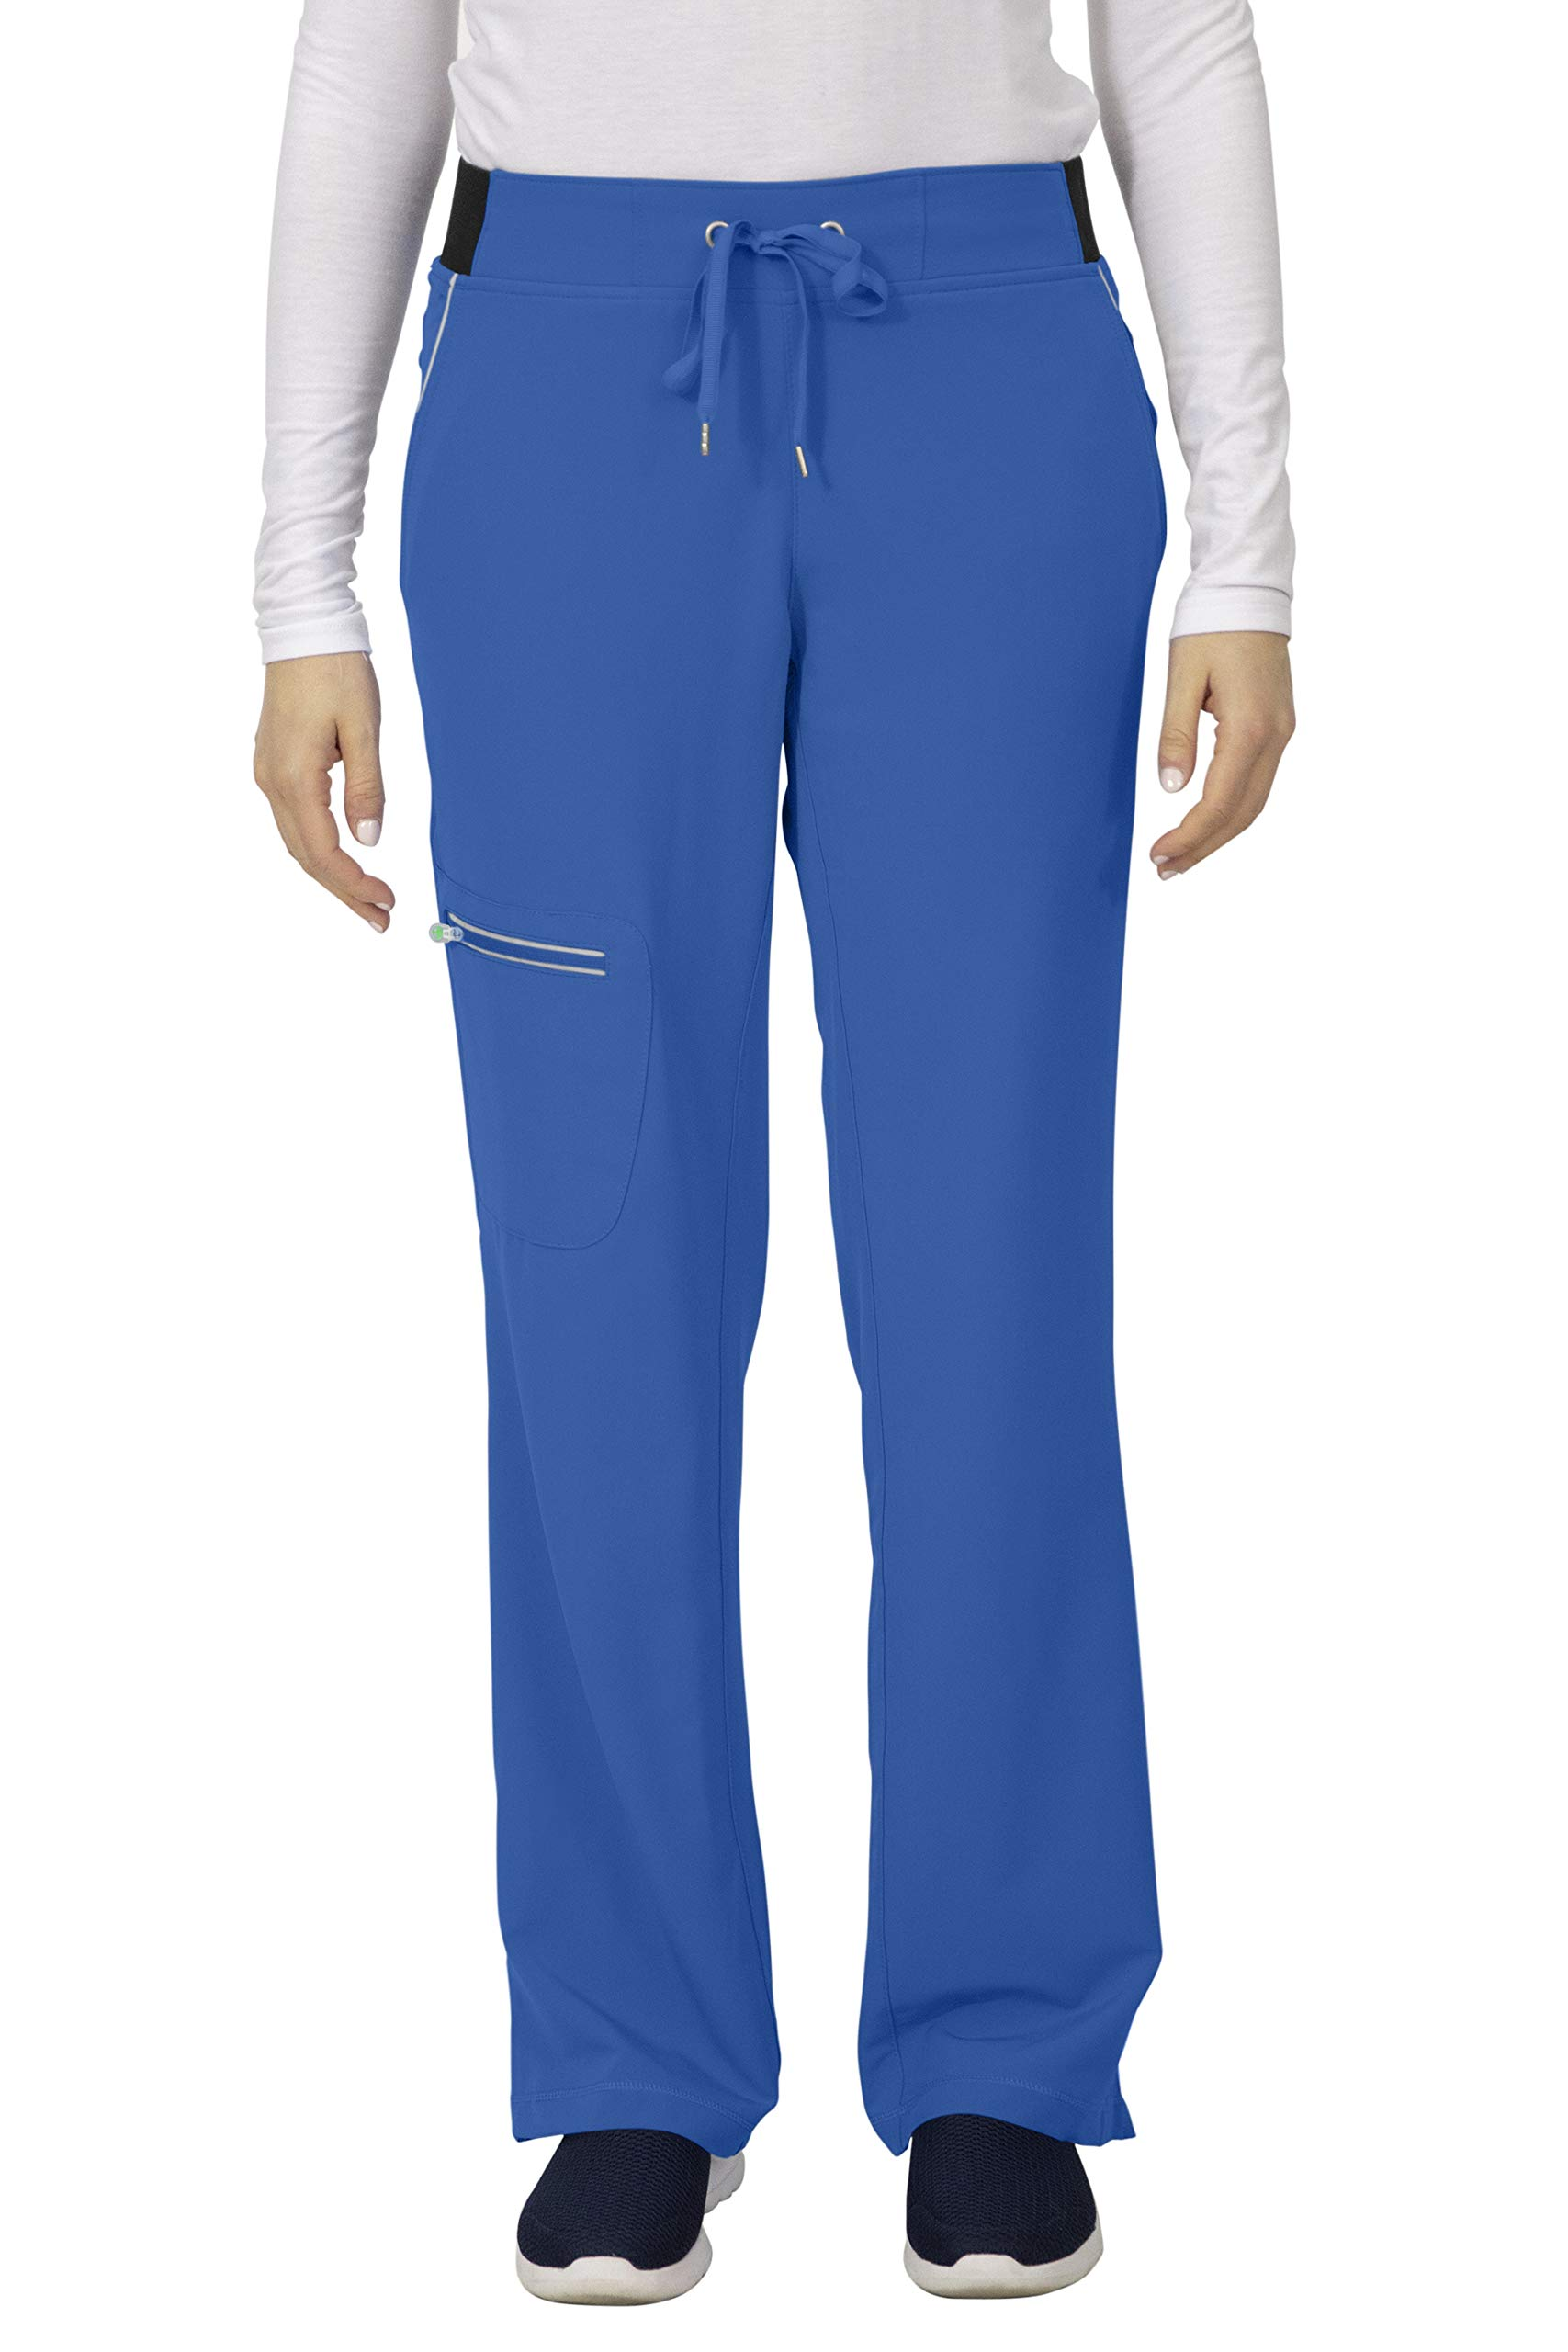 healing hands HH360 Women's Nisha 9151 Yoga Waist Scrub Pant- Royal Blue- X-Small Tall